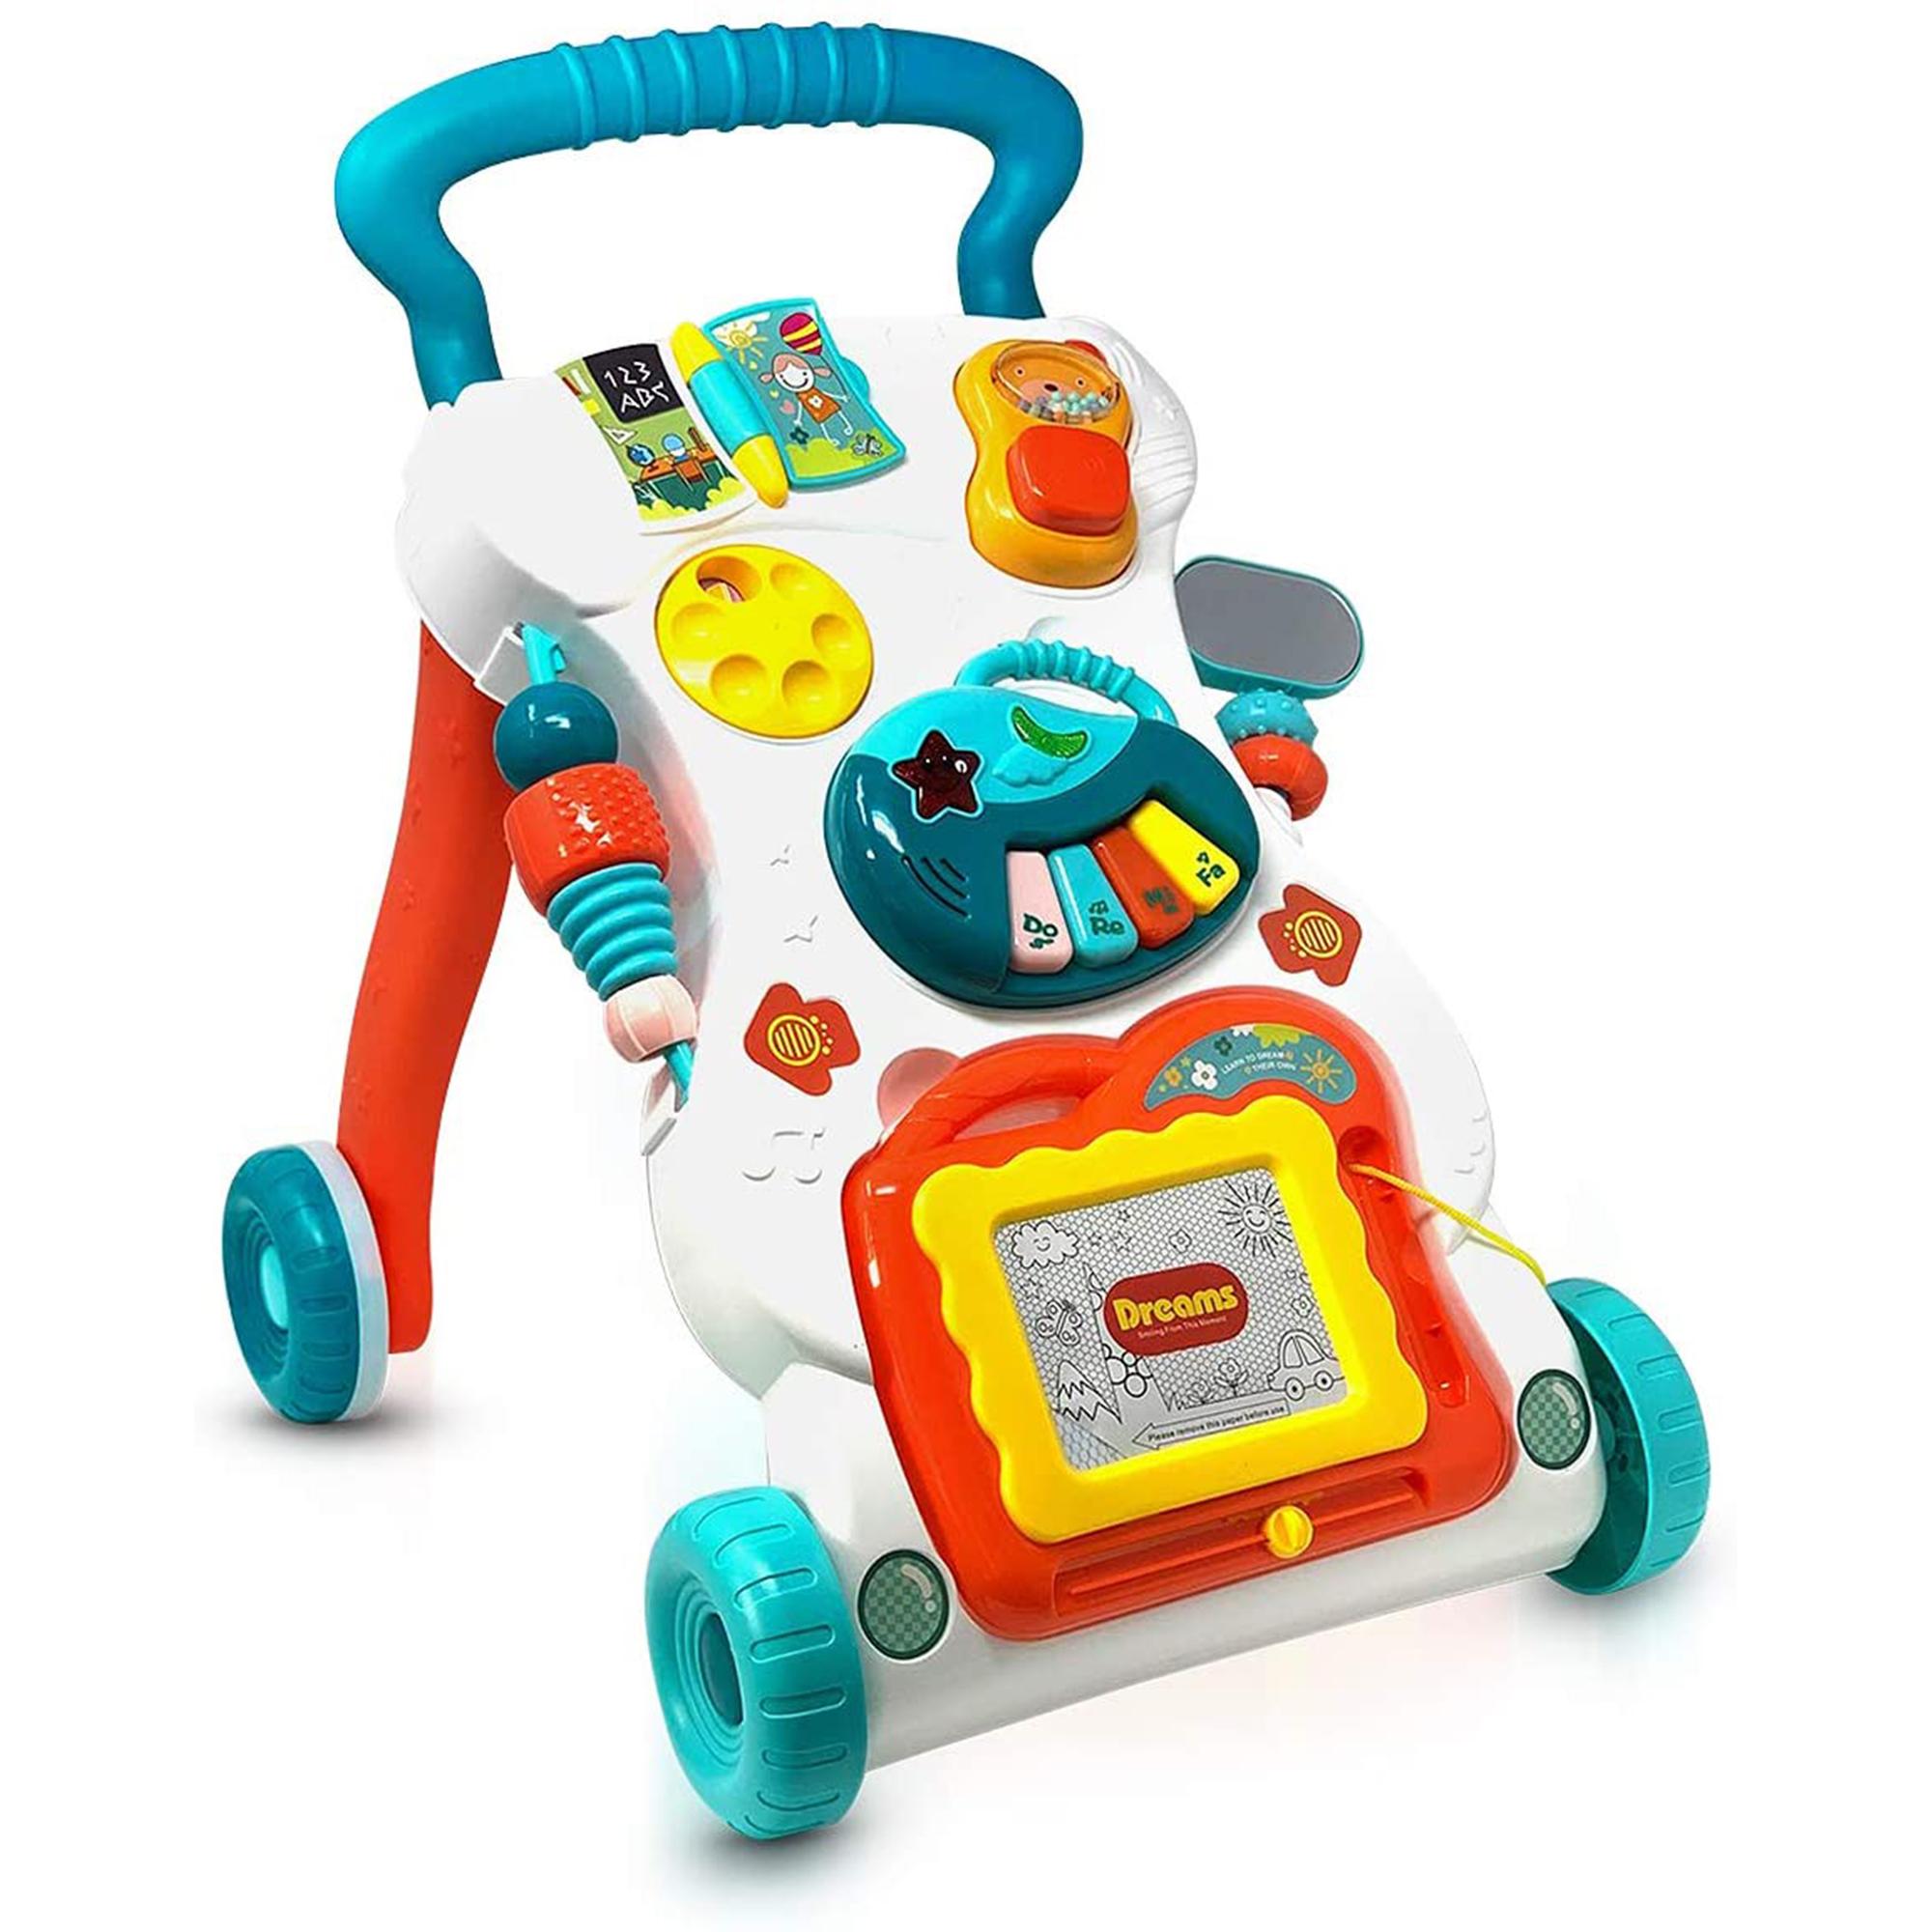 واکر کودک هانگر مدل HE-0819